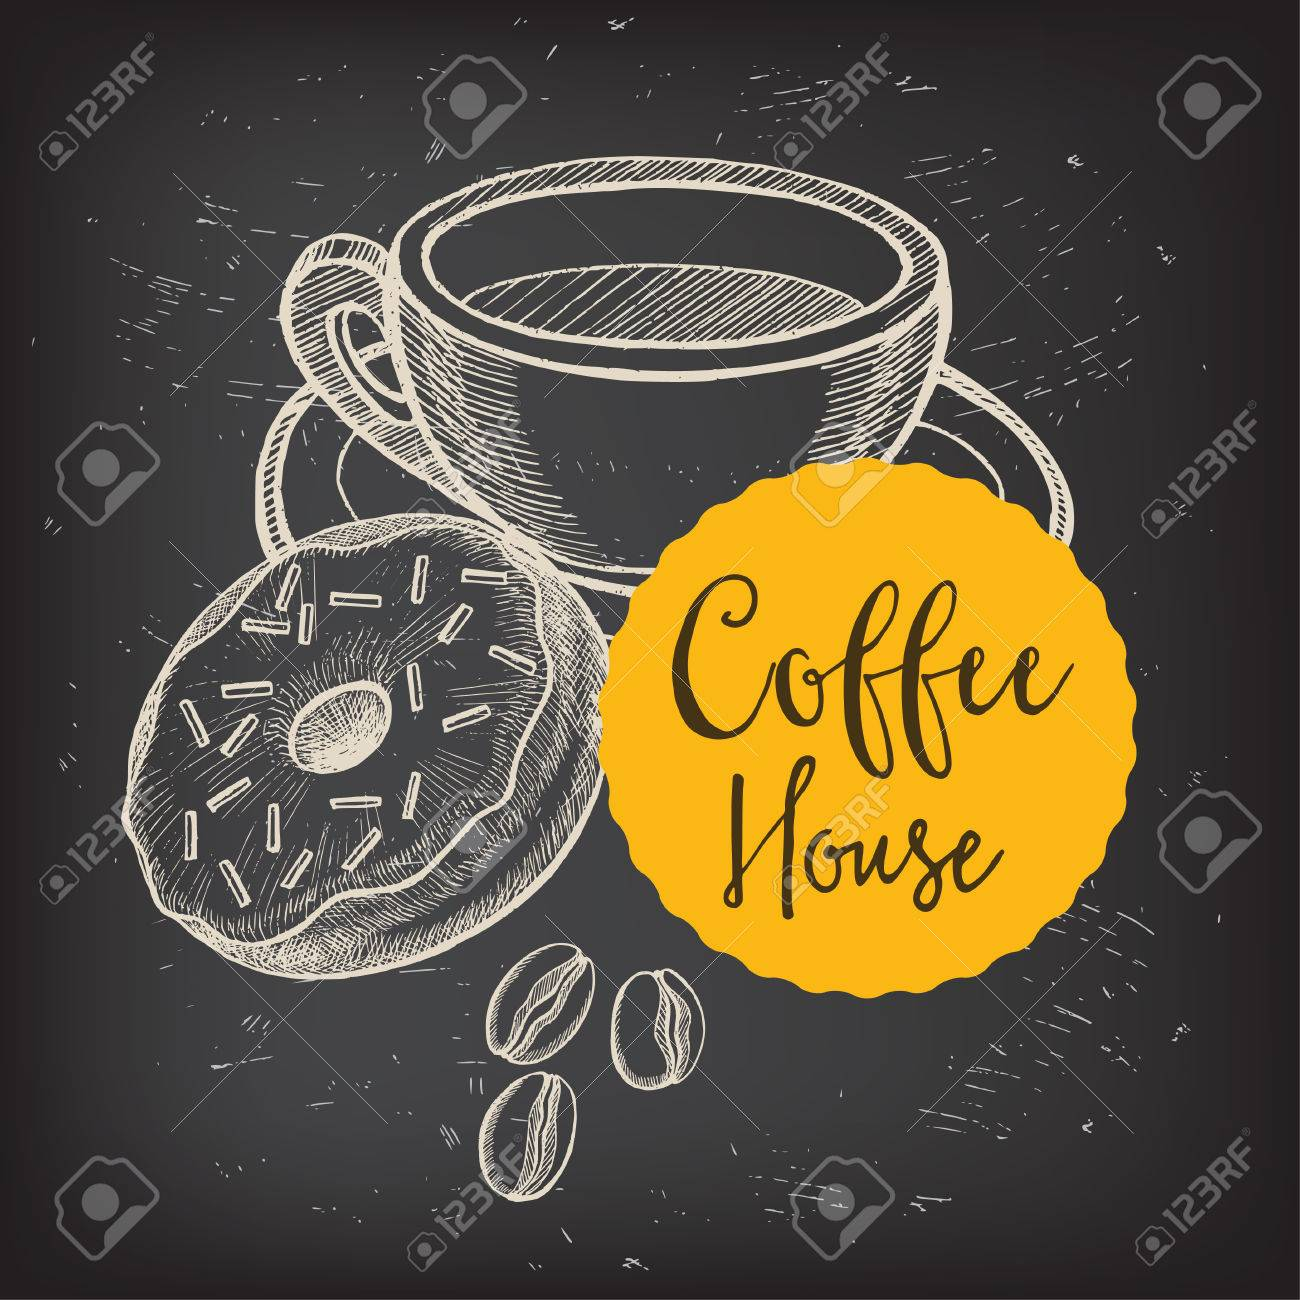 Kaffee Restaurant Broschüre Vektor, Coffee-Shop-Menü-Design ...